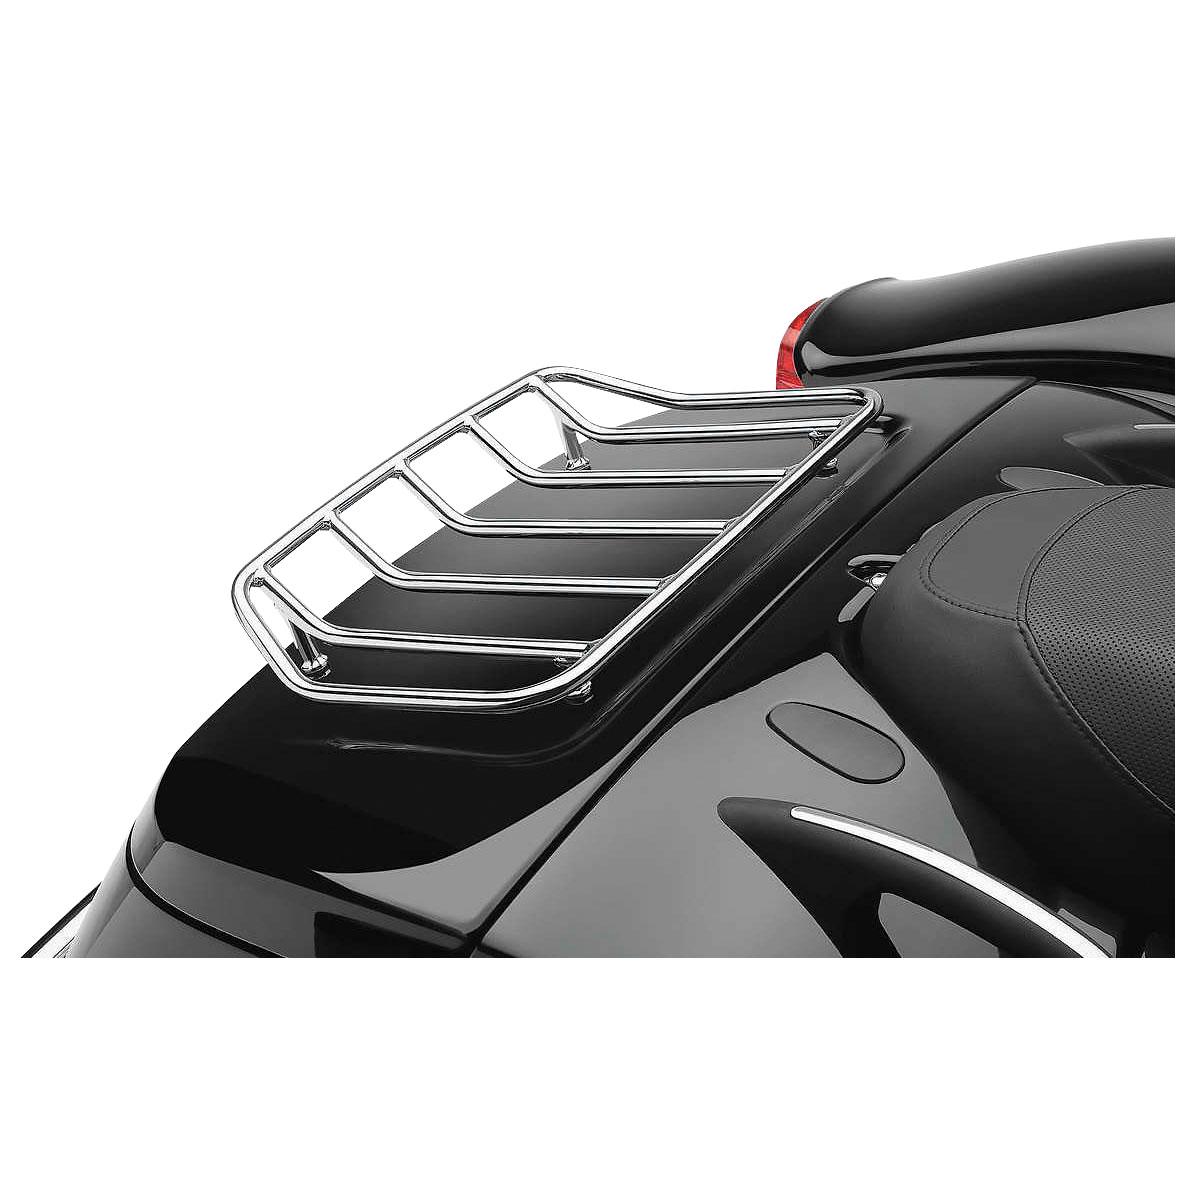 Cobra Luggage Rack Chrome